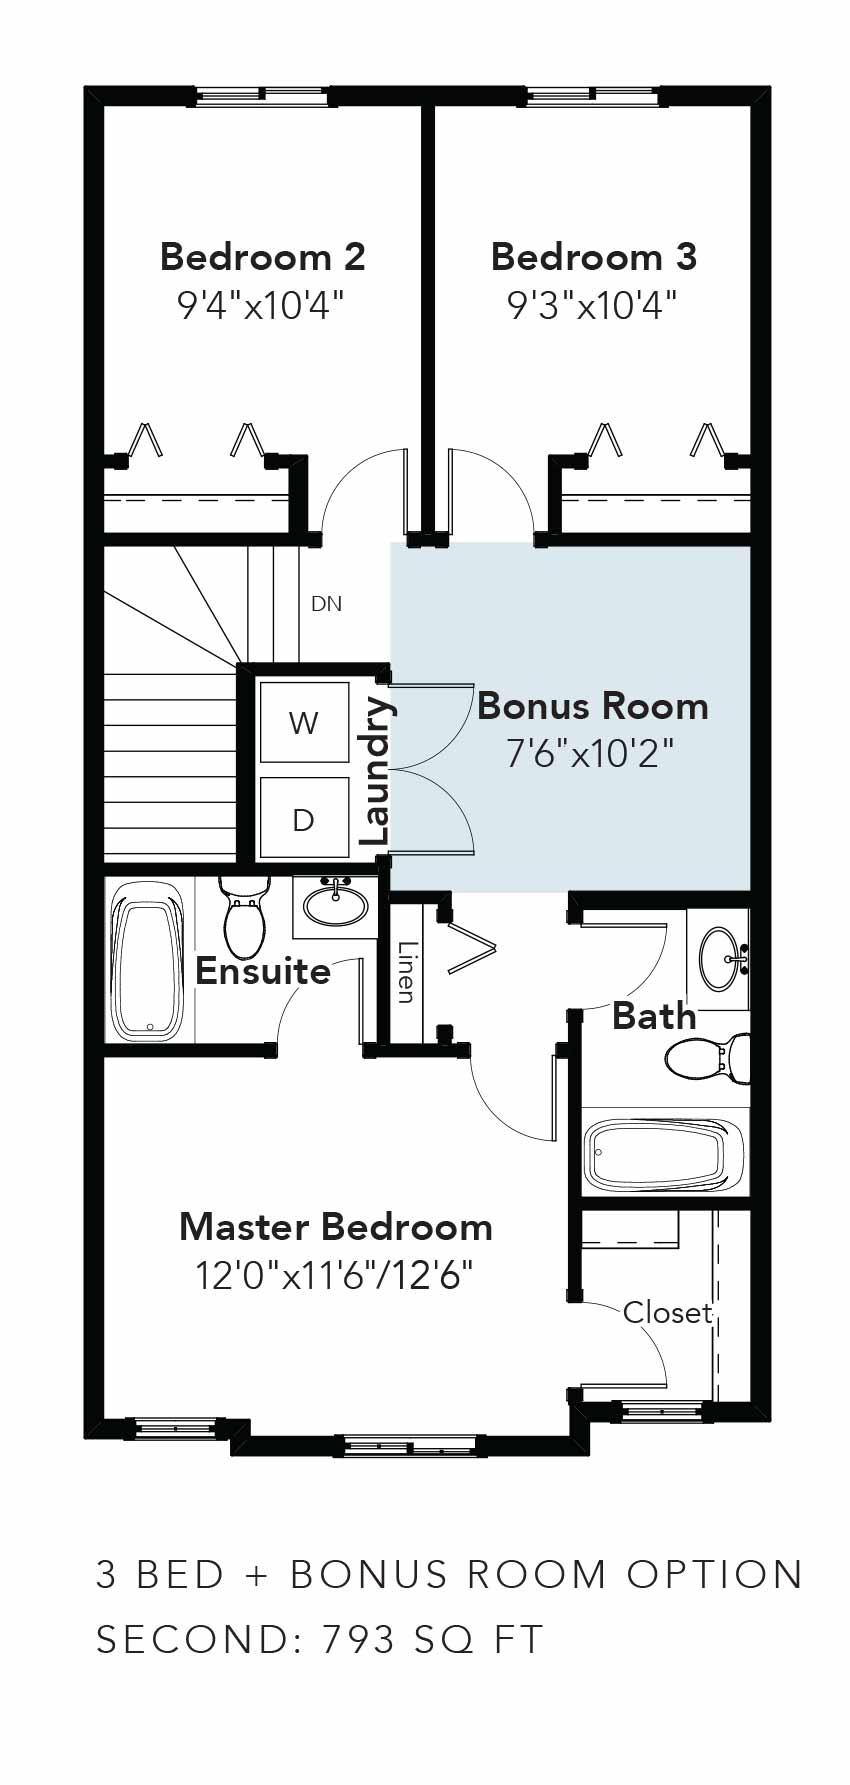 Niagara 3 Bed + Bonus Room